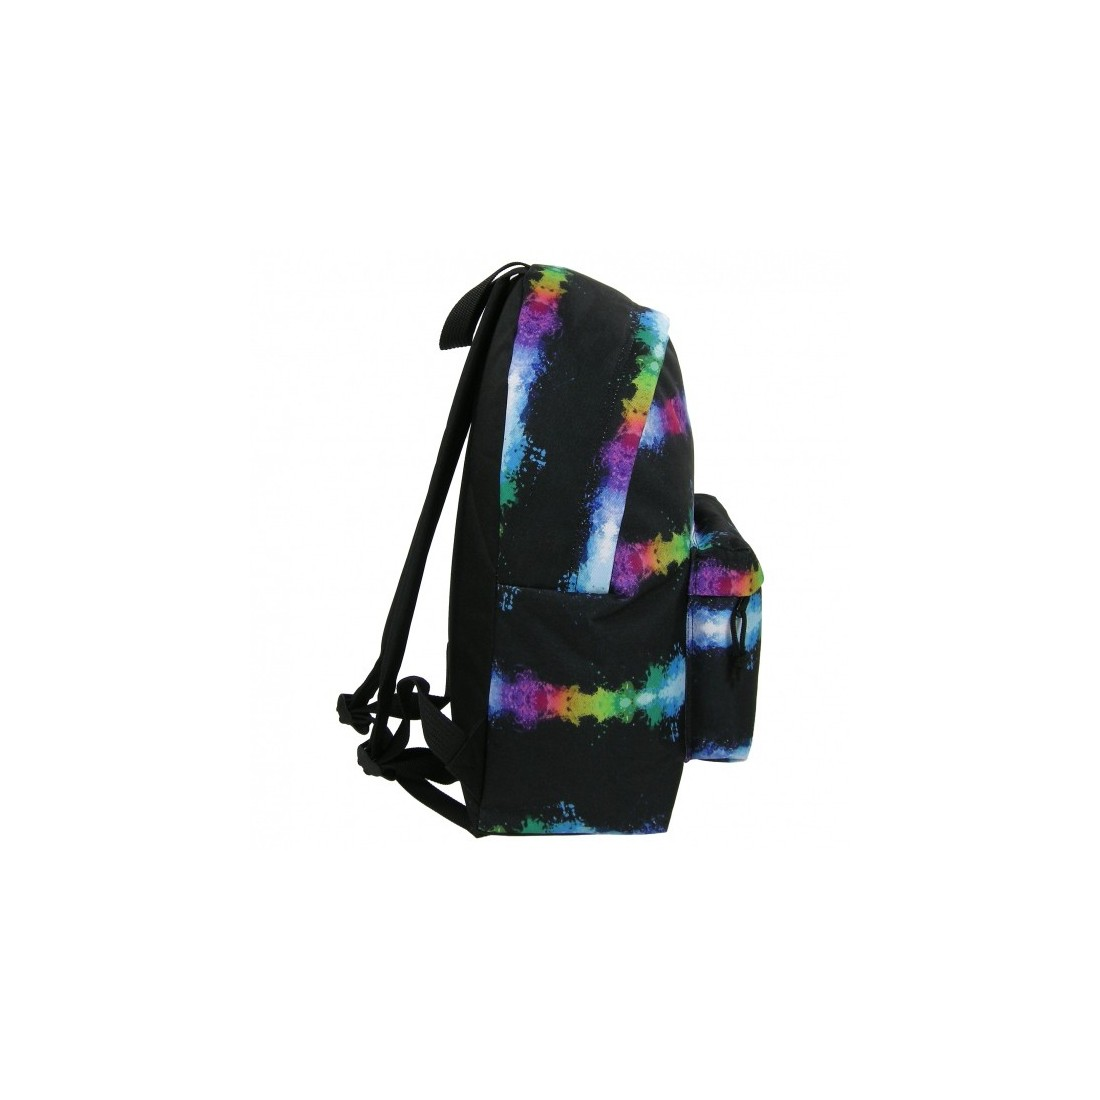 Plecak młodzieżowy Fullprint Soundwave - plecak-tornister.pl